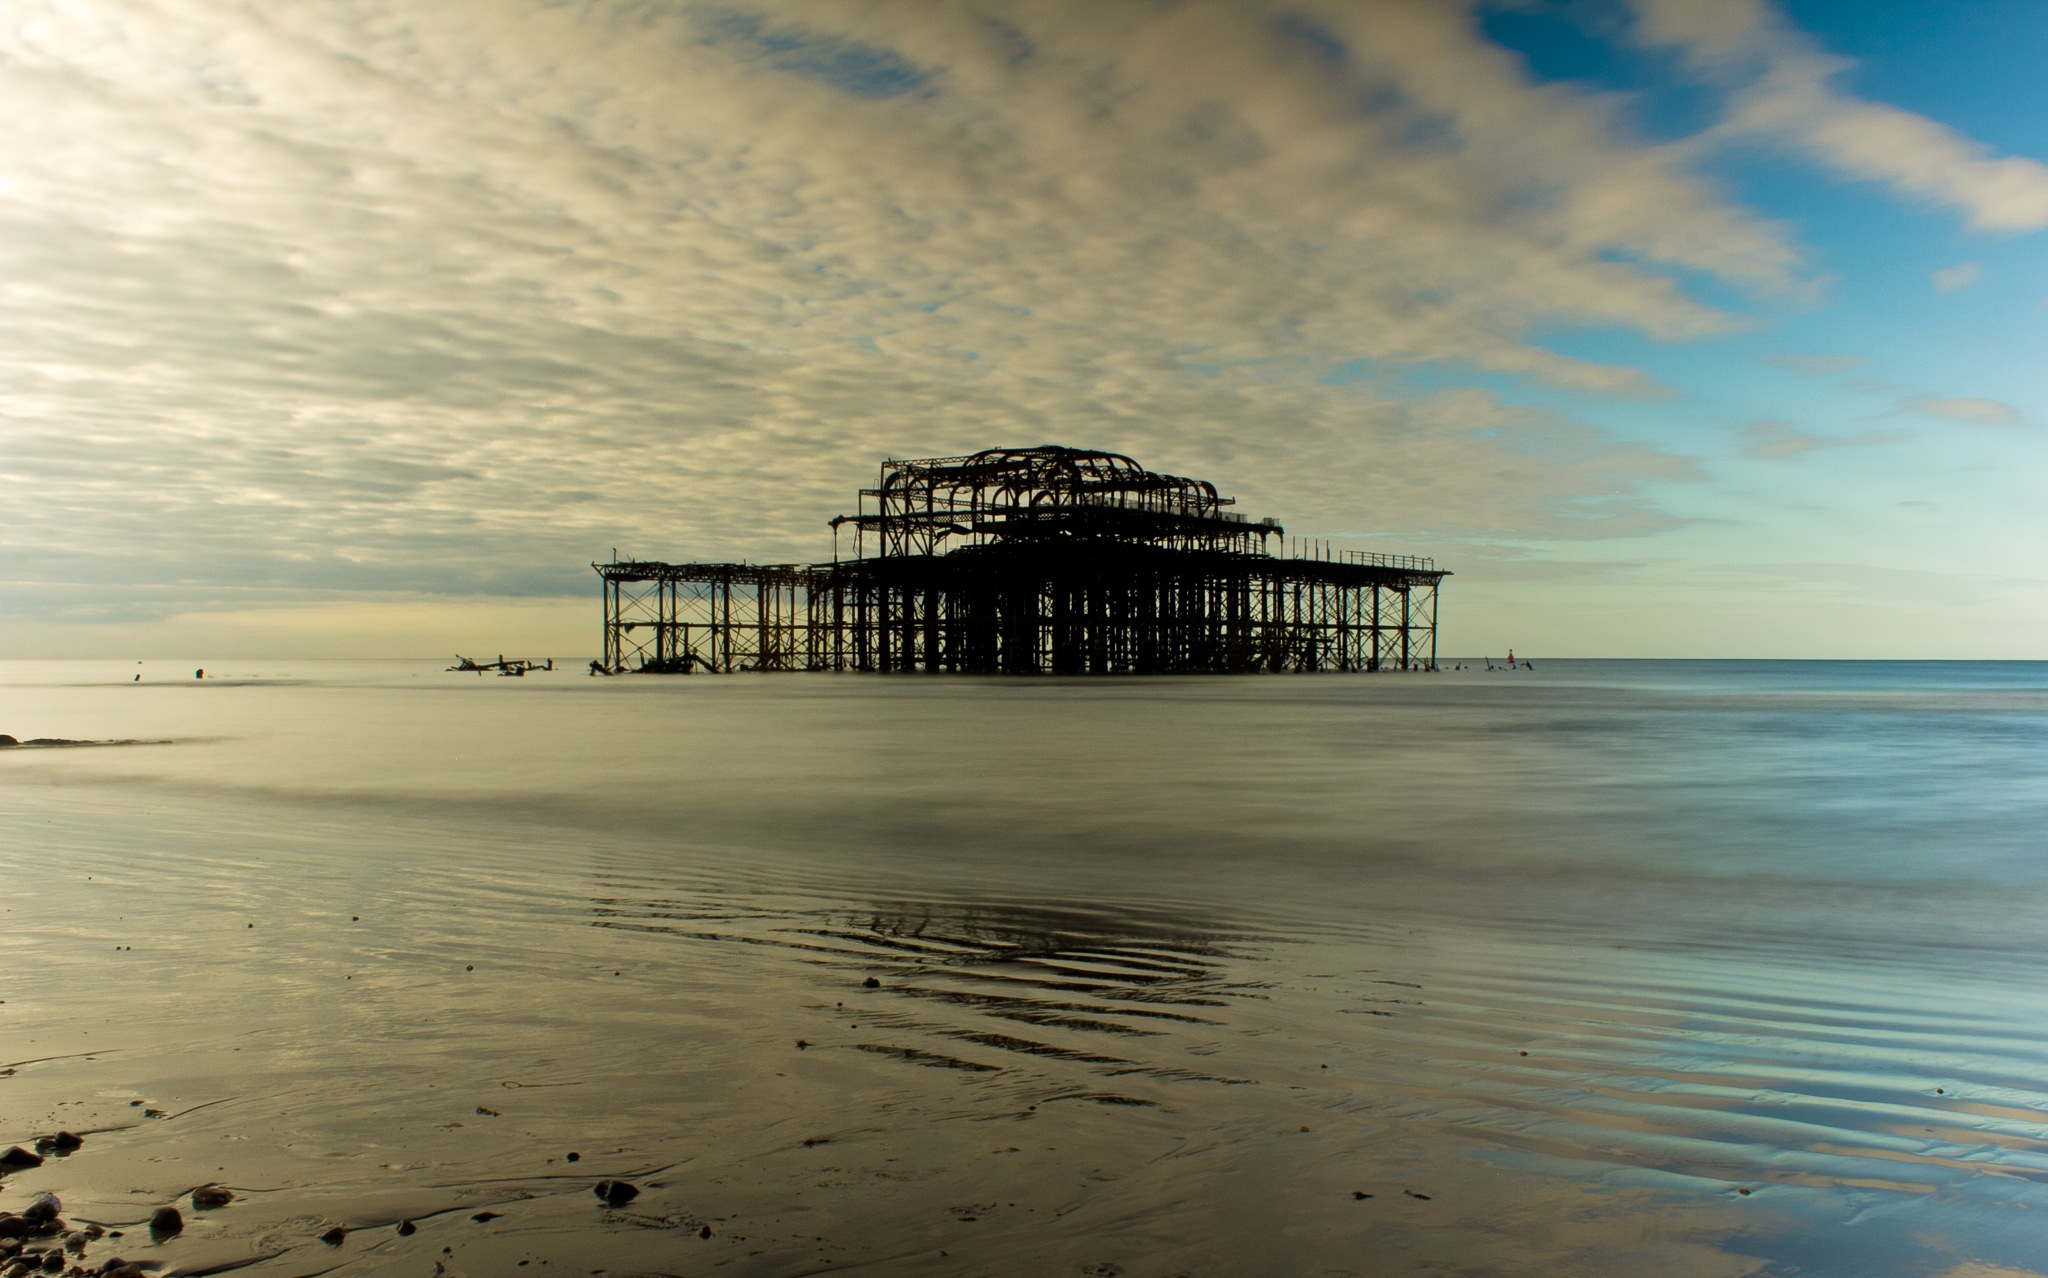 brighton pier  by eddie.powell.9809